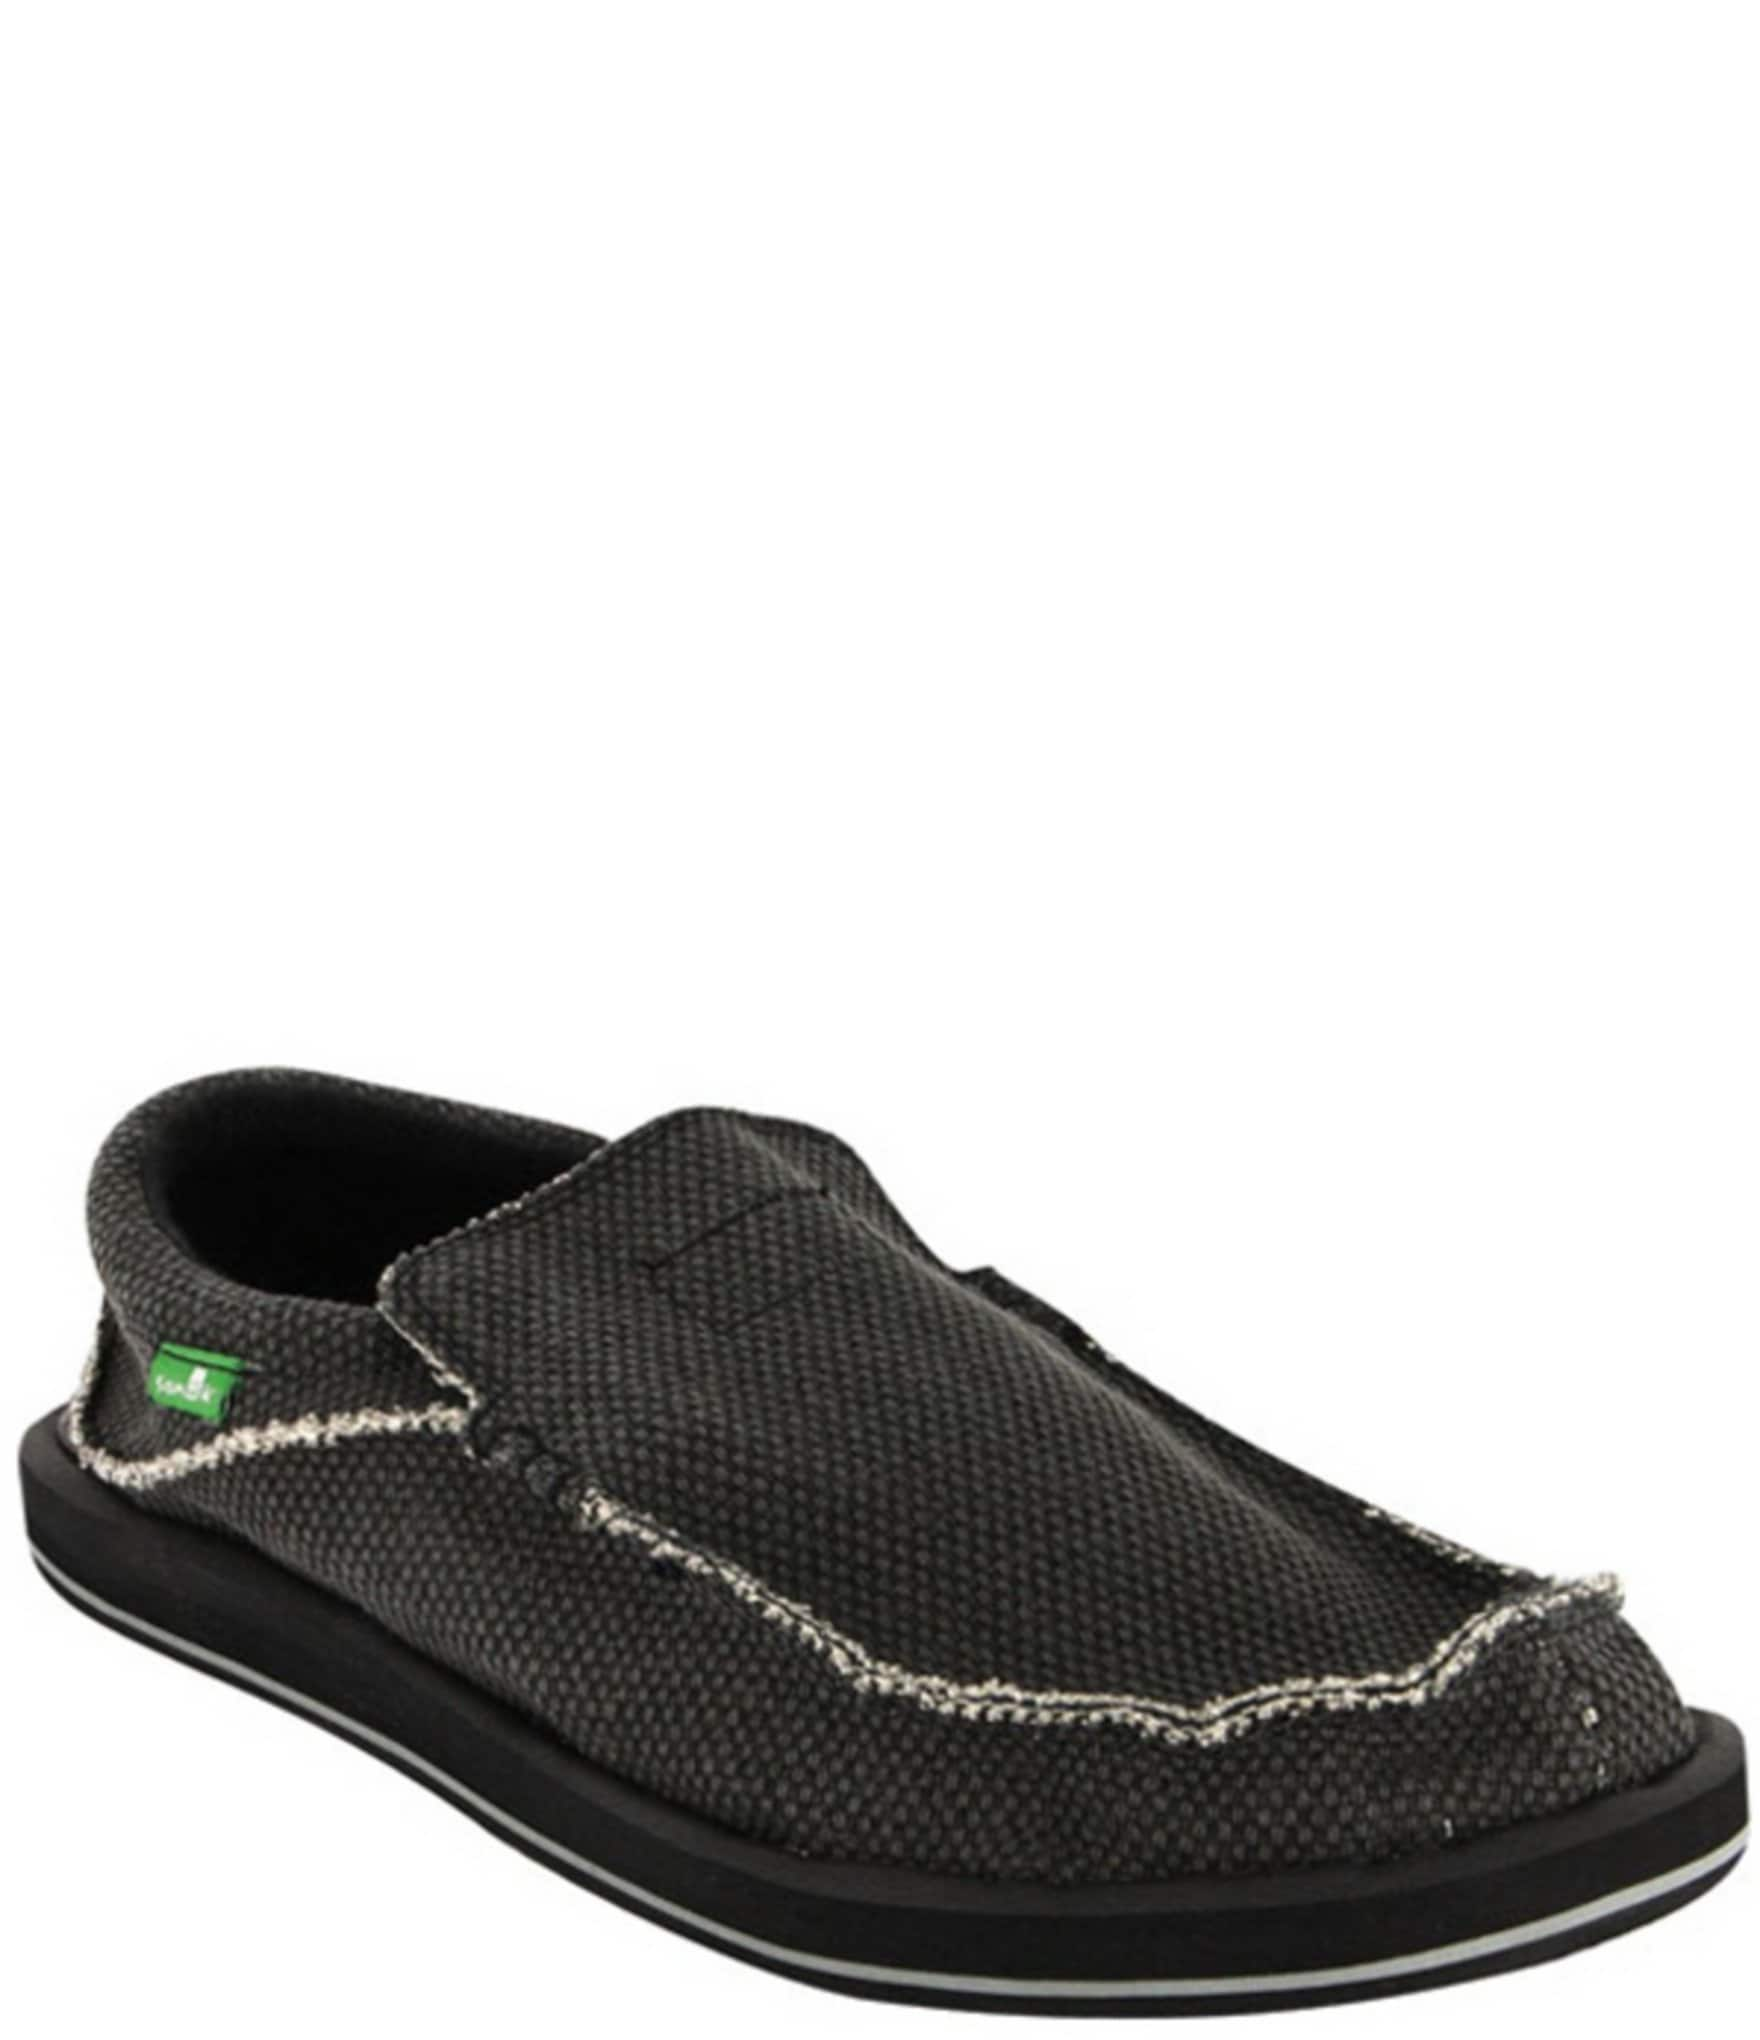 Sanuk Chiba Slip-On Shoes   Dillards